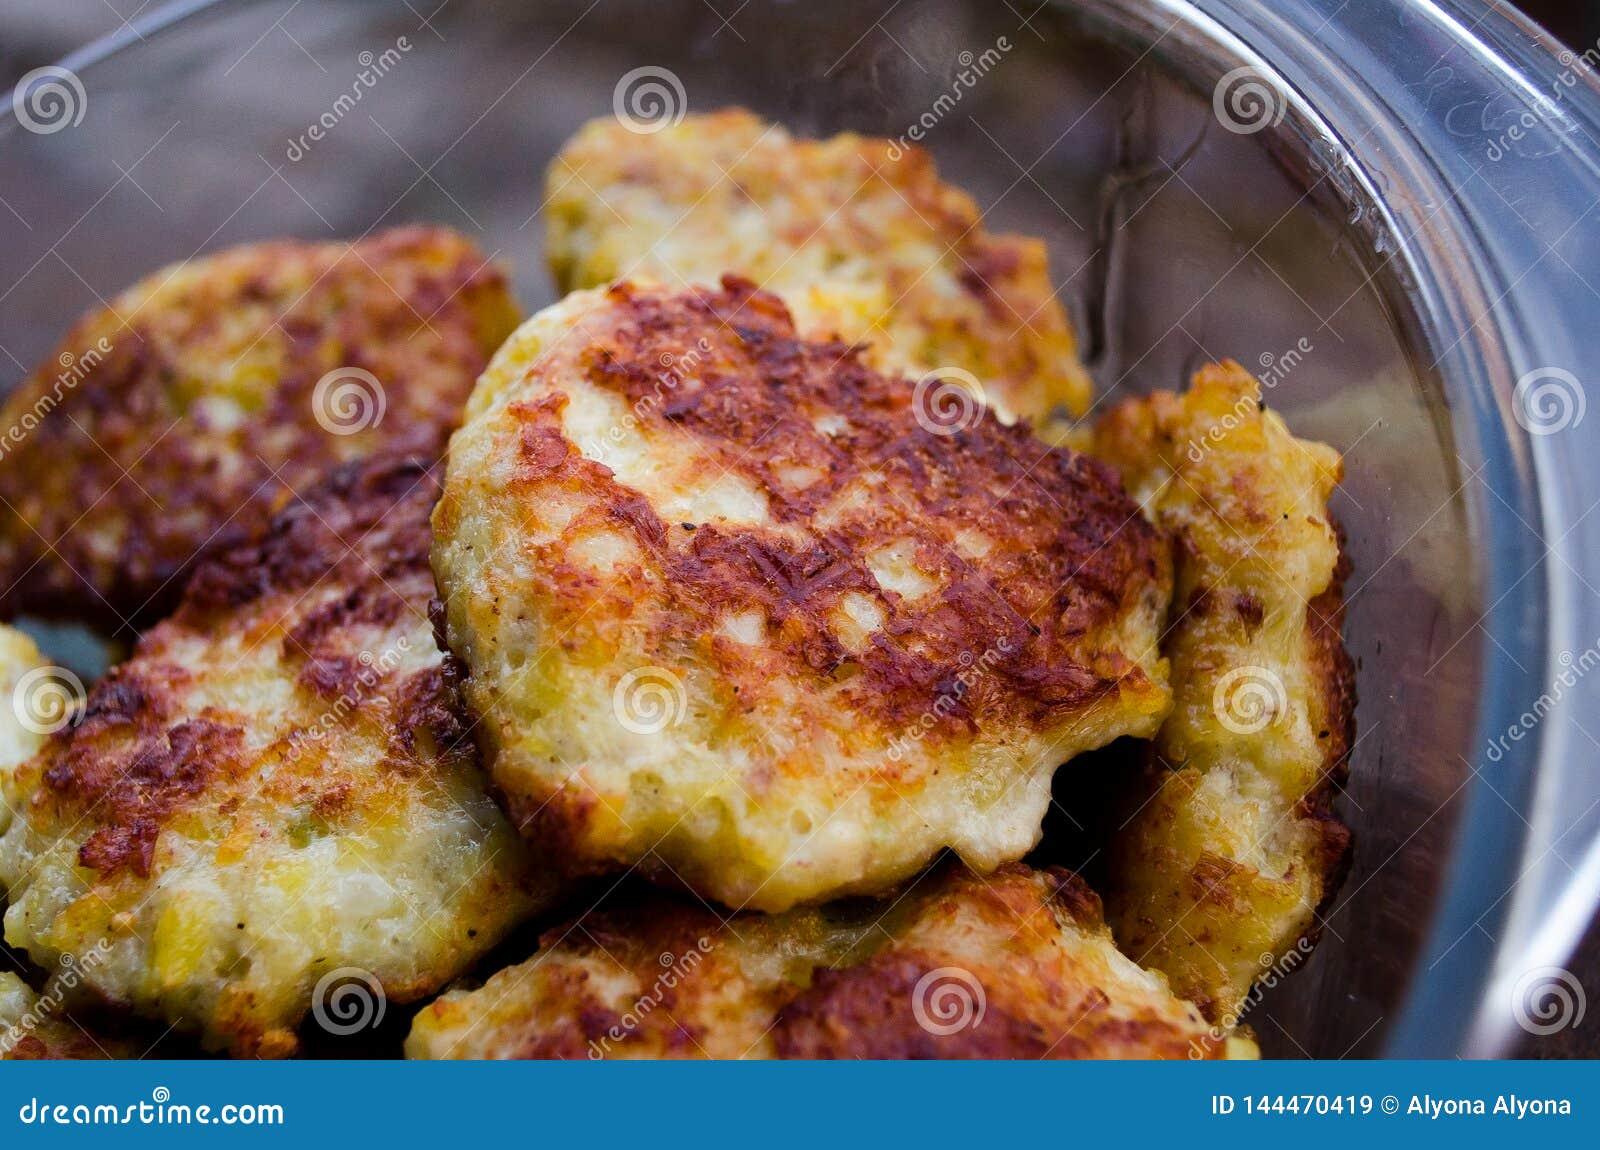 Koteletts H?hnerkoteletts Gebratene Koteletts Koteletts im Topf Richtige Nahrung Kochen von k?stlichen Burgern Glaswanne mit Flei